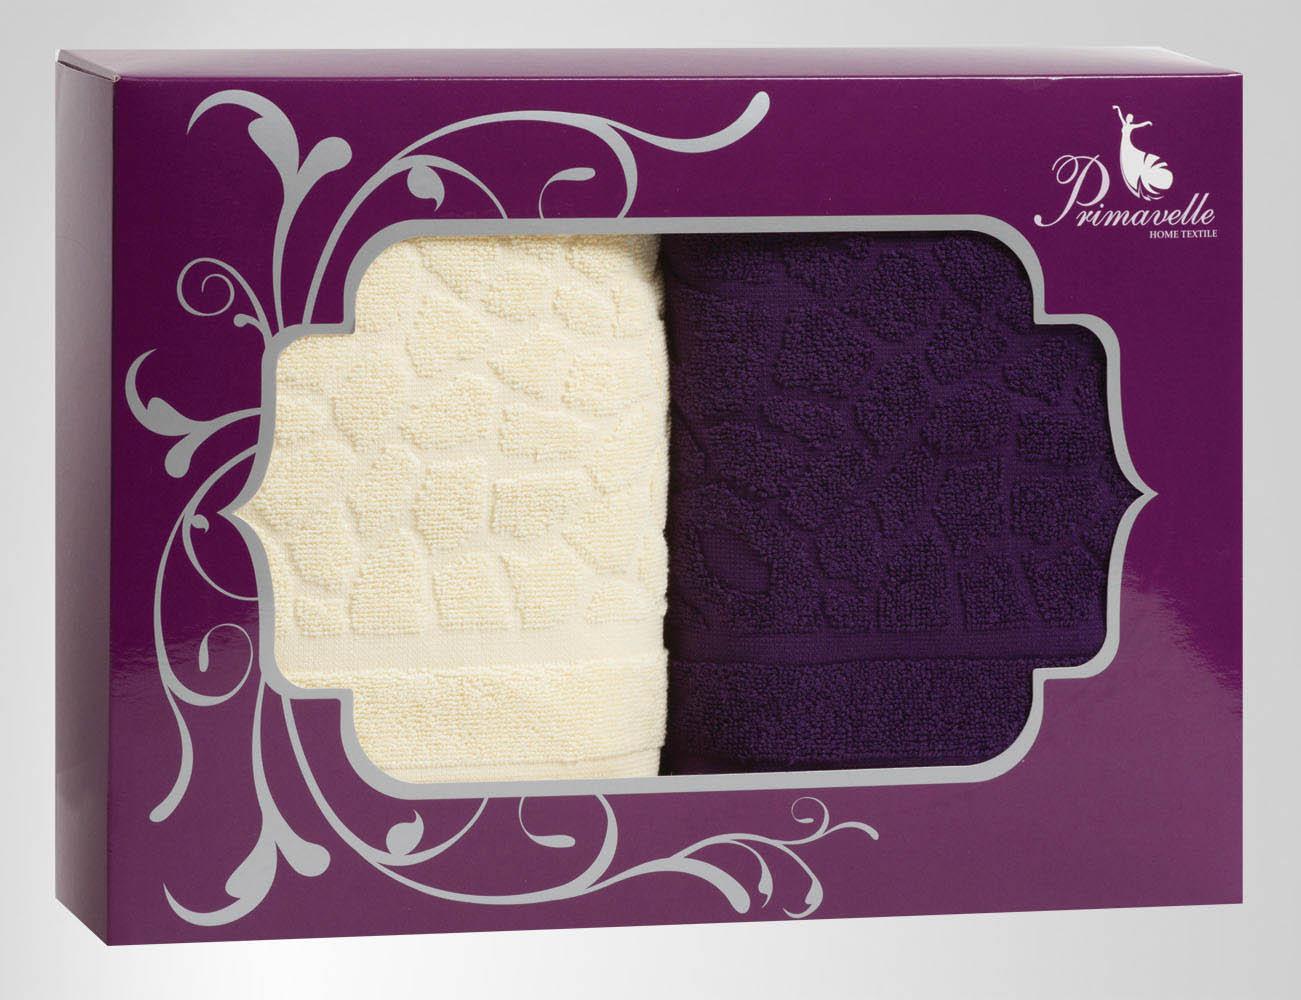 Полотенца Primavelle Полотенце Vitra Цвет: Фиолетовый+Ваниль (50х90 см - 2 шт) цена и фото